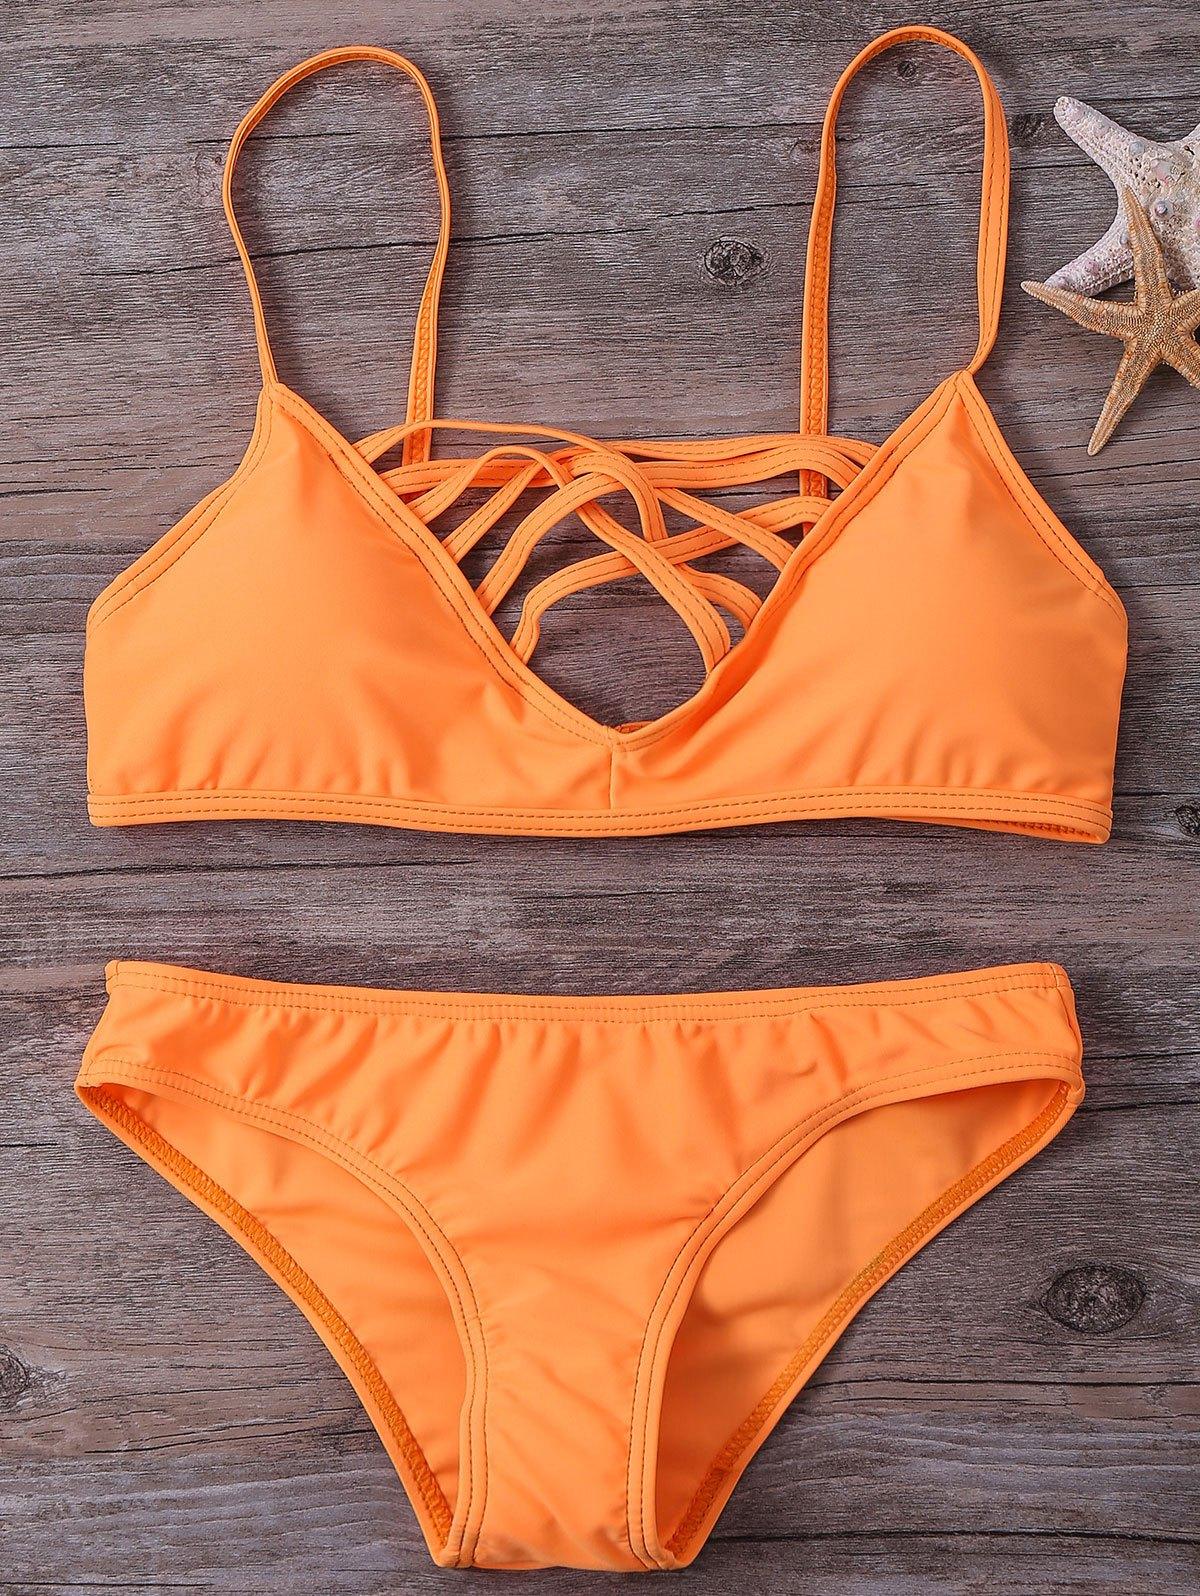 Cami Hollow Out  Bikini Set